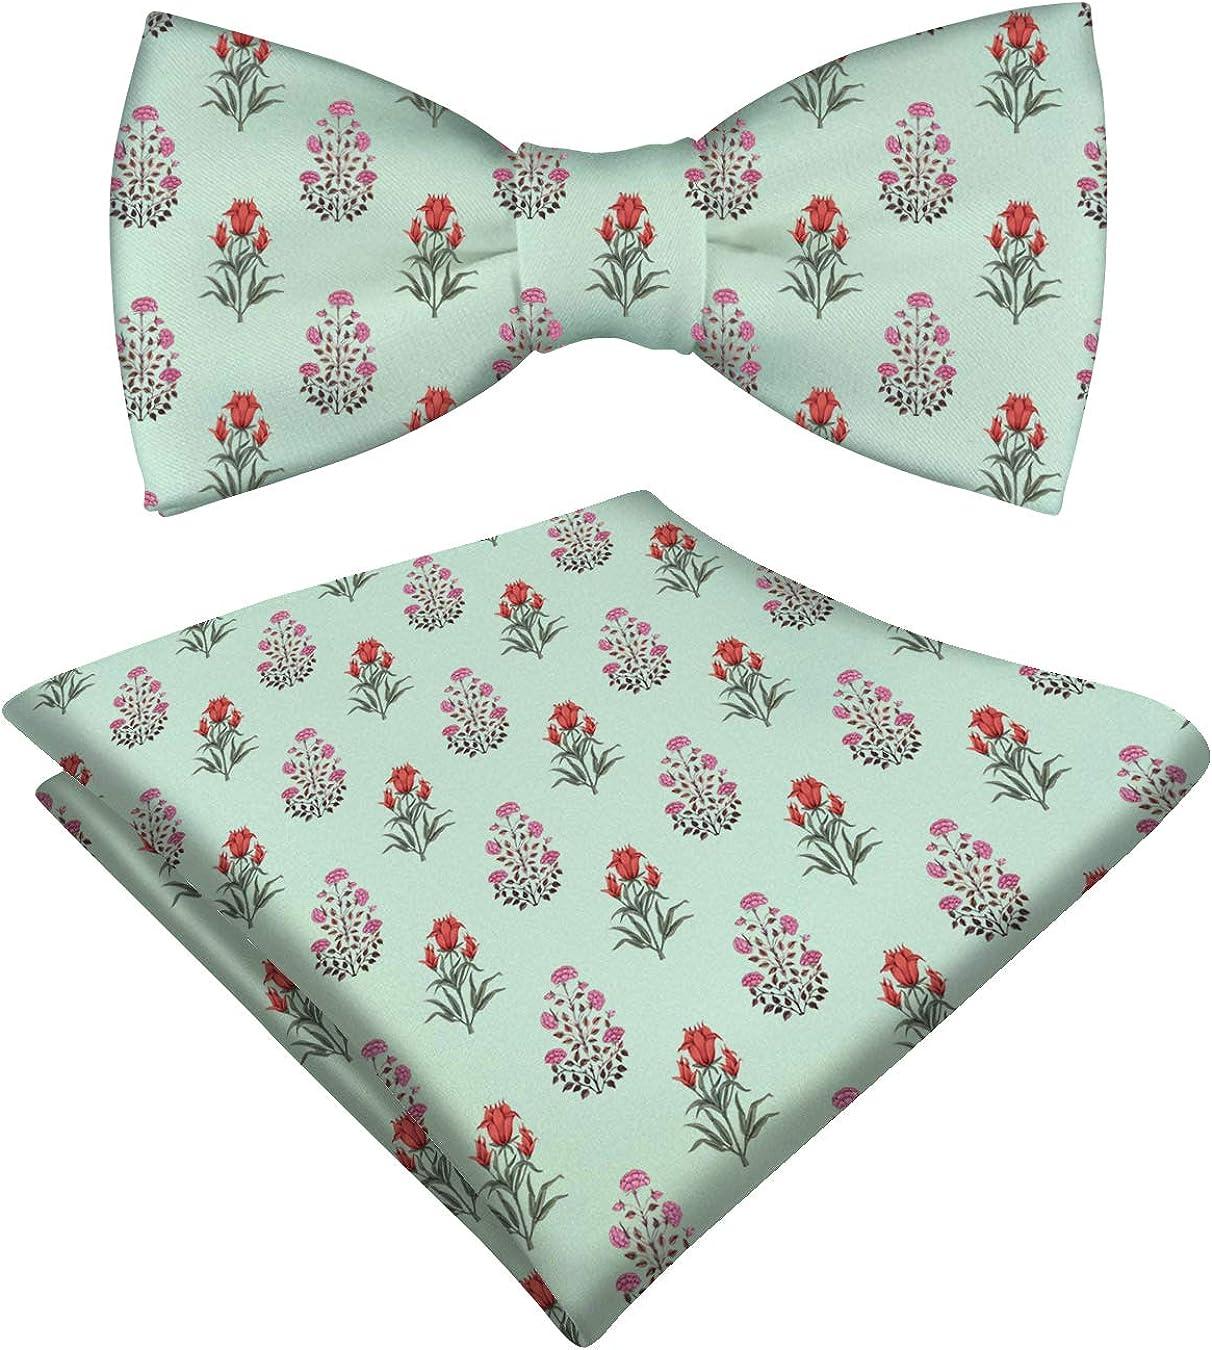 RADANYA Satin Bow Tie Floral Printed With Pocket Square Hanky